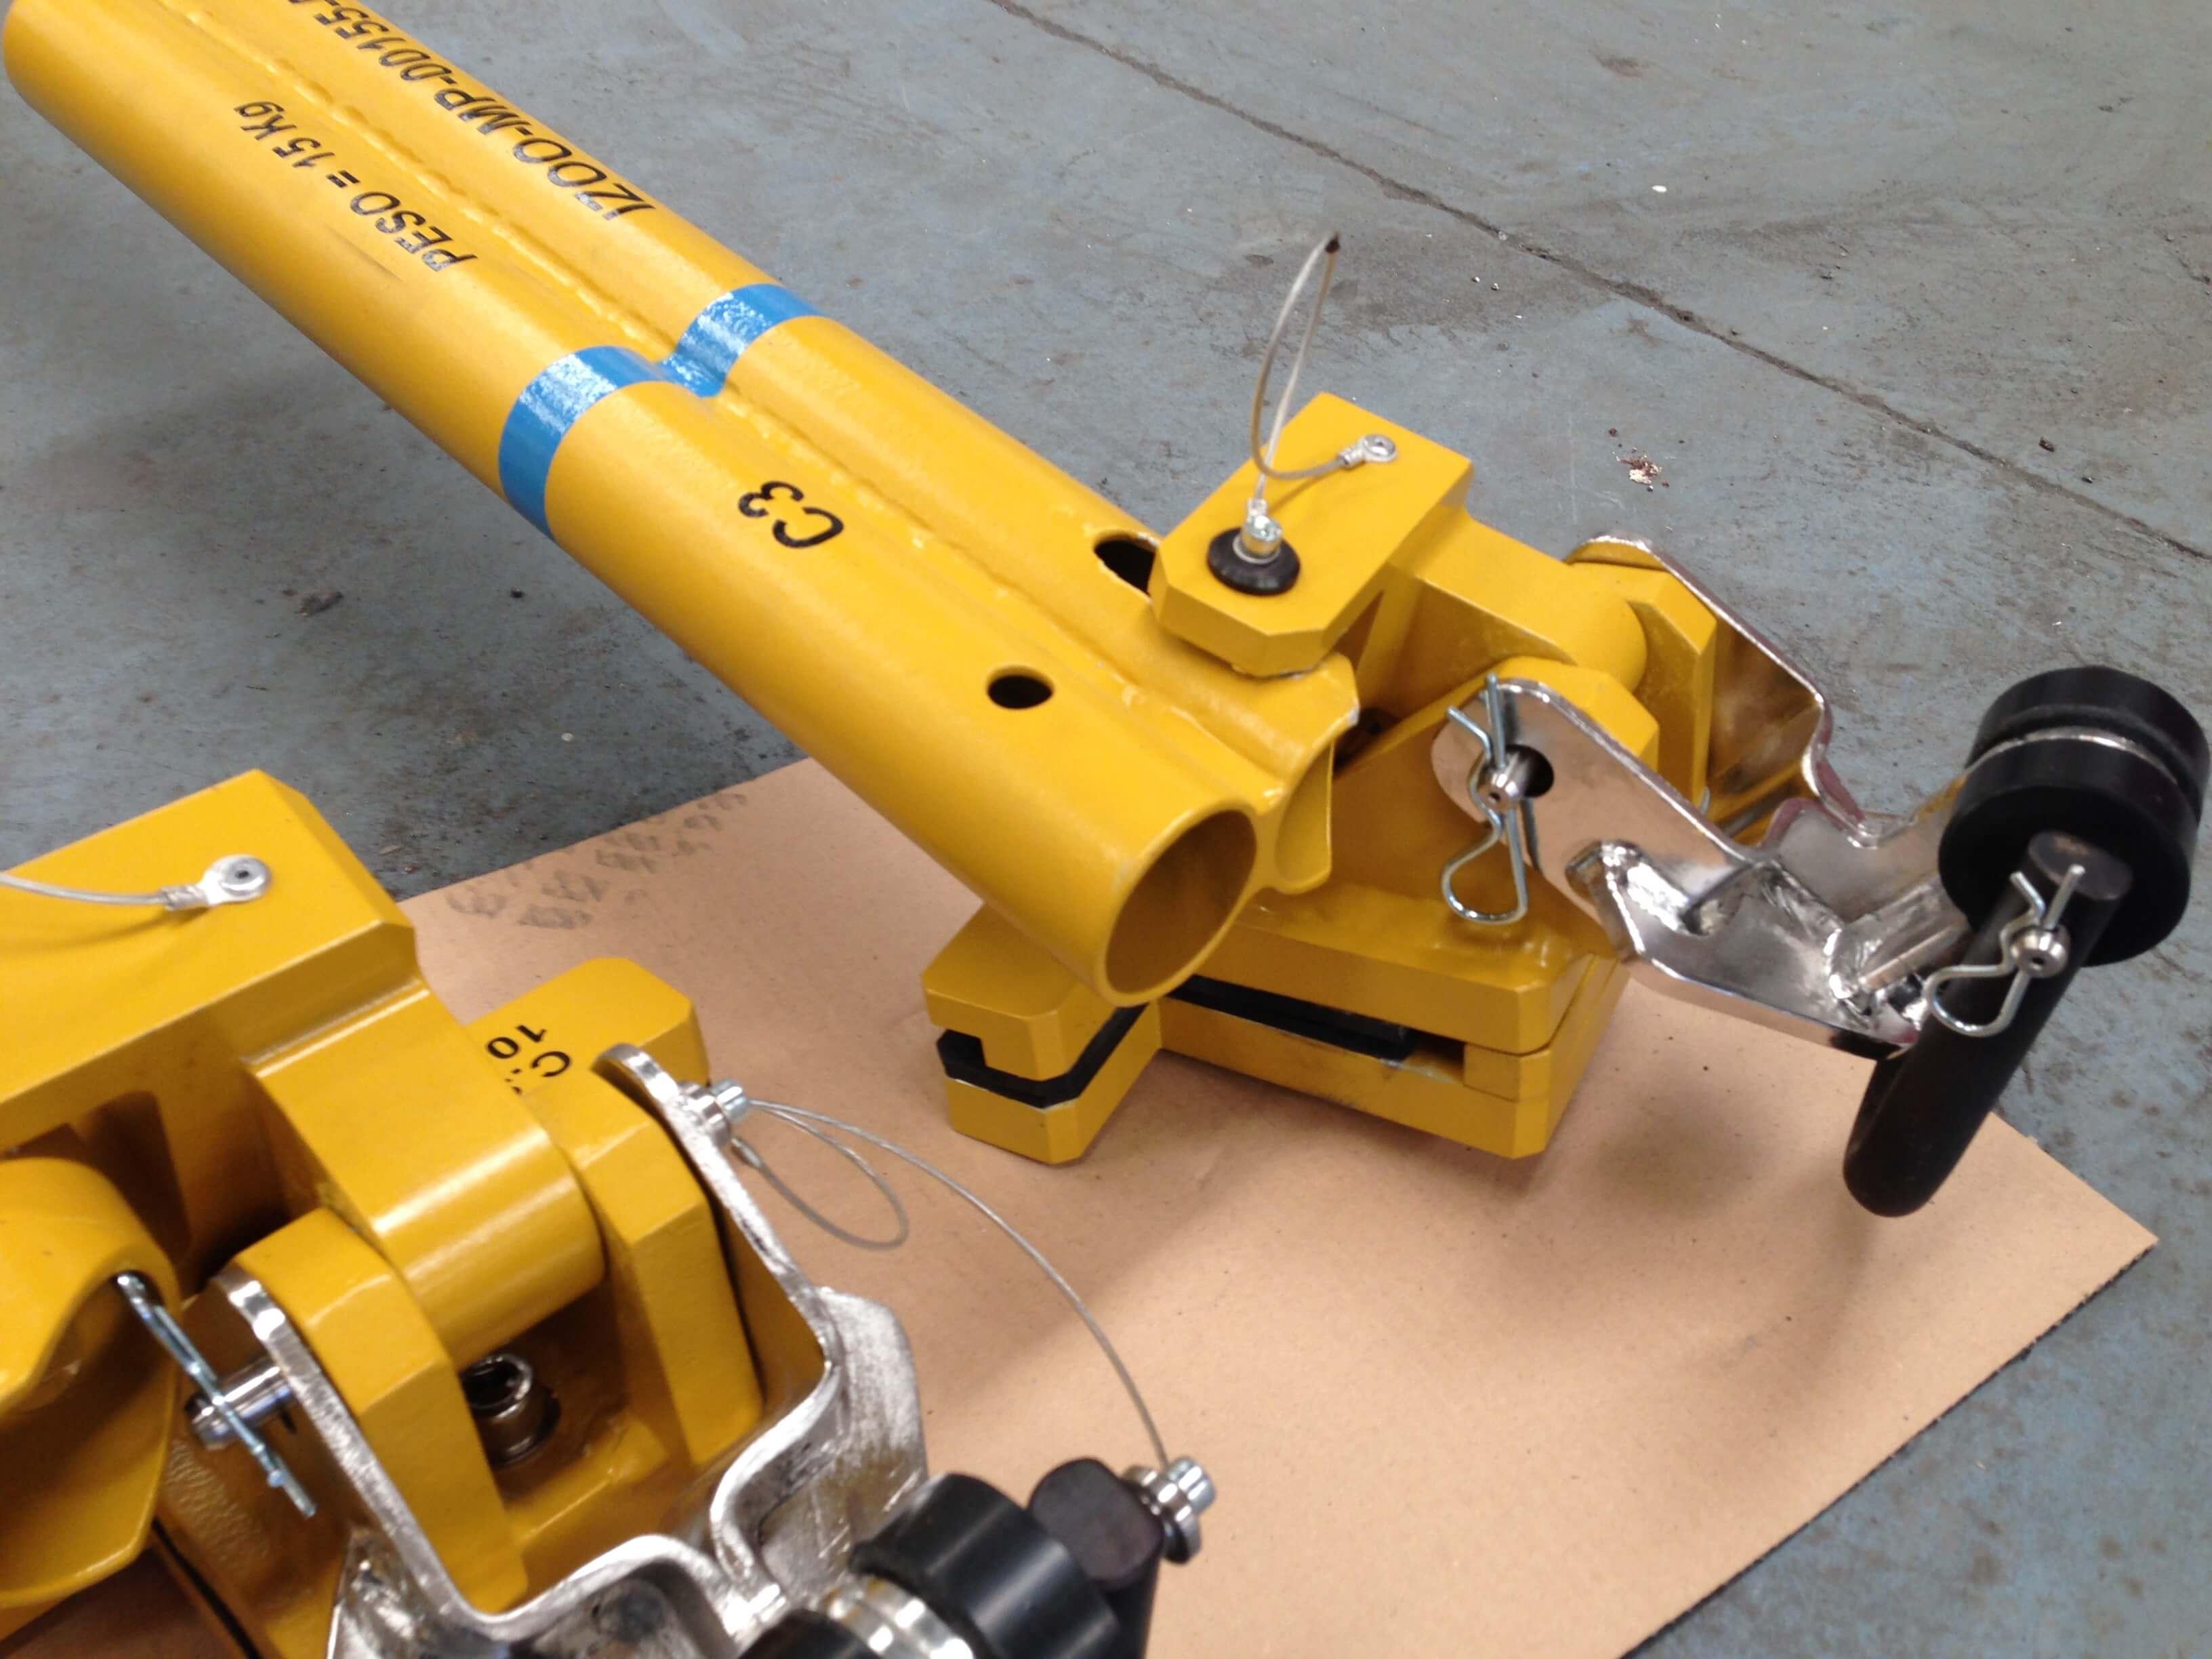 IMG 1126 1 1 - Lifting Tools